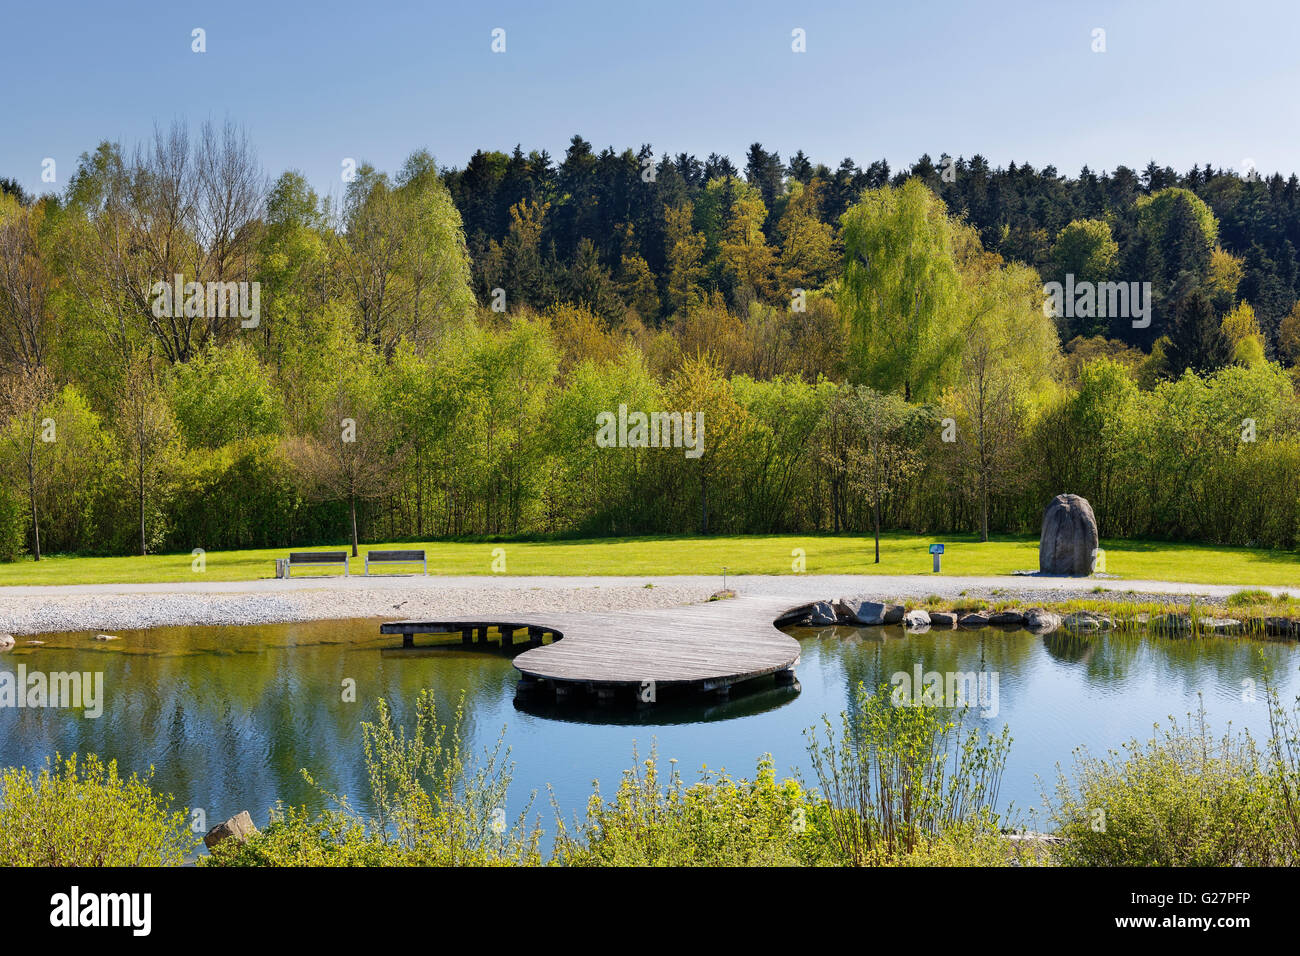 Il Feng Shui park, Lalling, Lallinger Winkel, Foresta Bavarese, Bassa Baviera, Baviera, Germania Immagini Stock